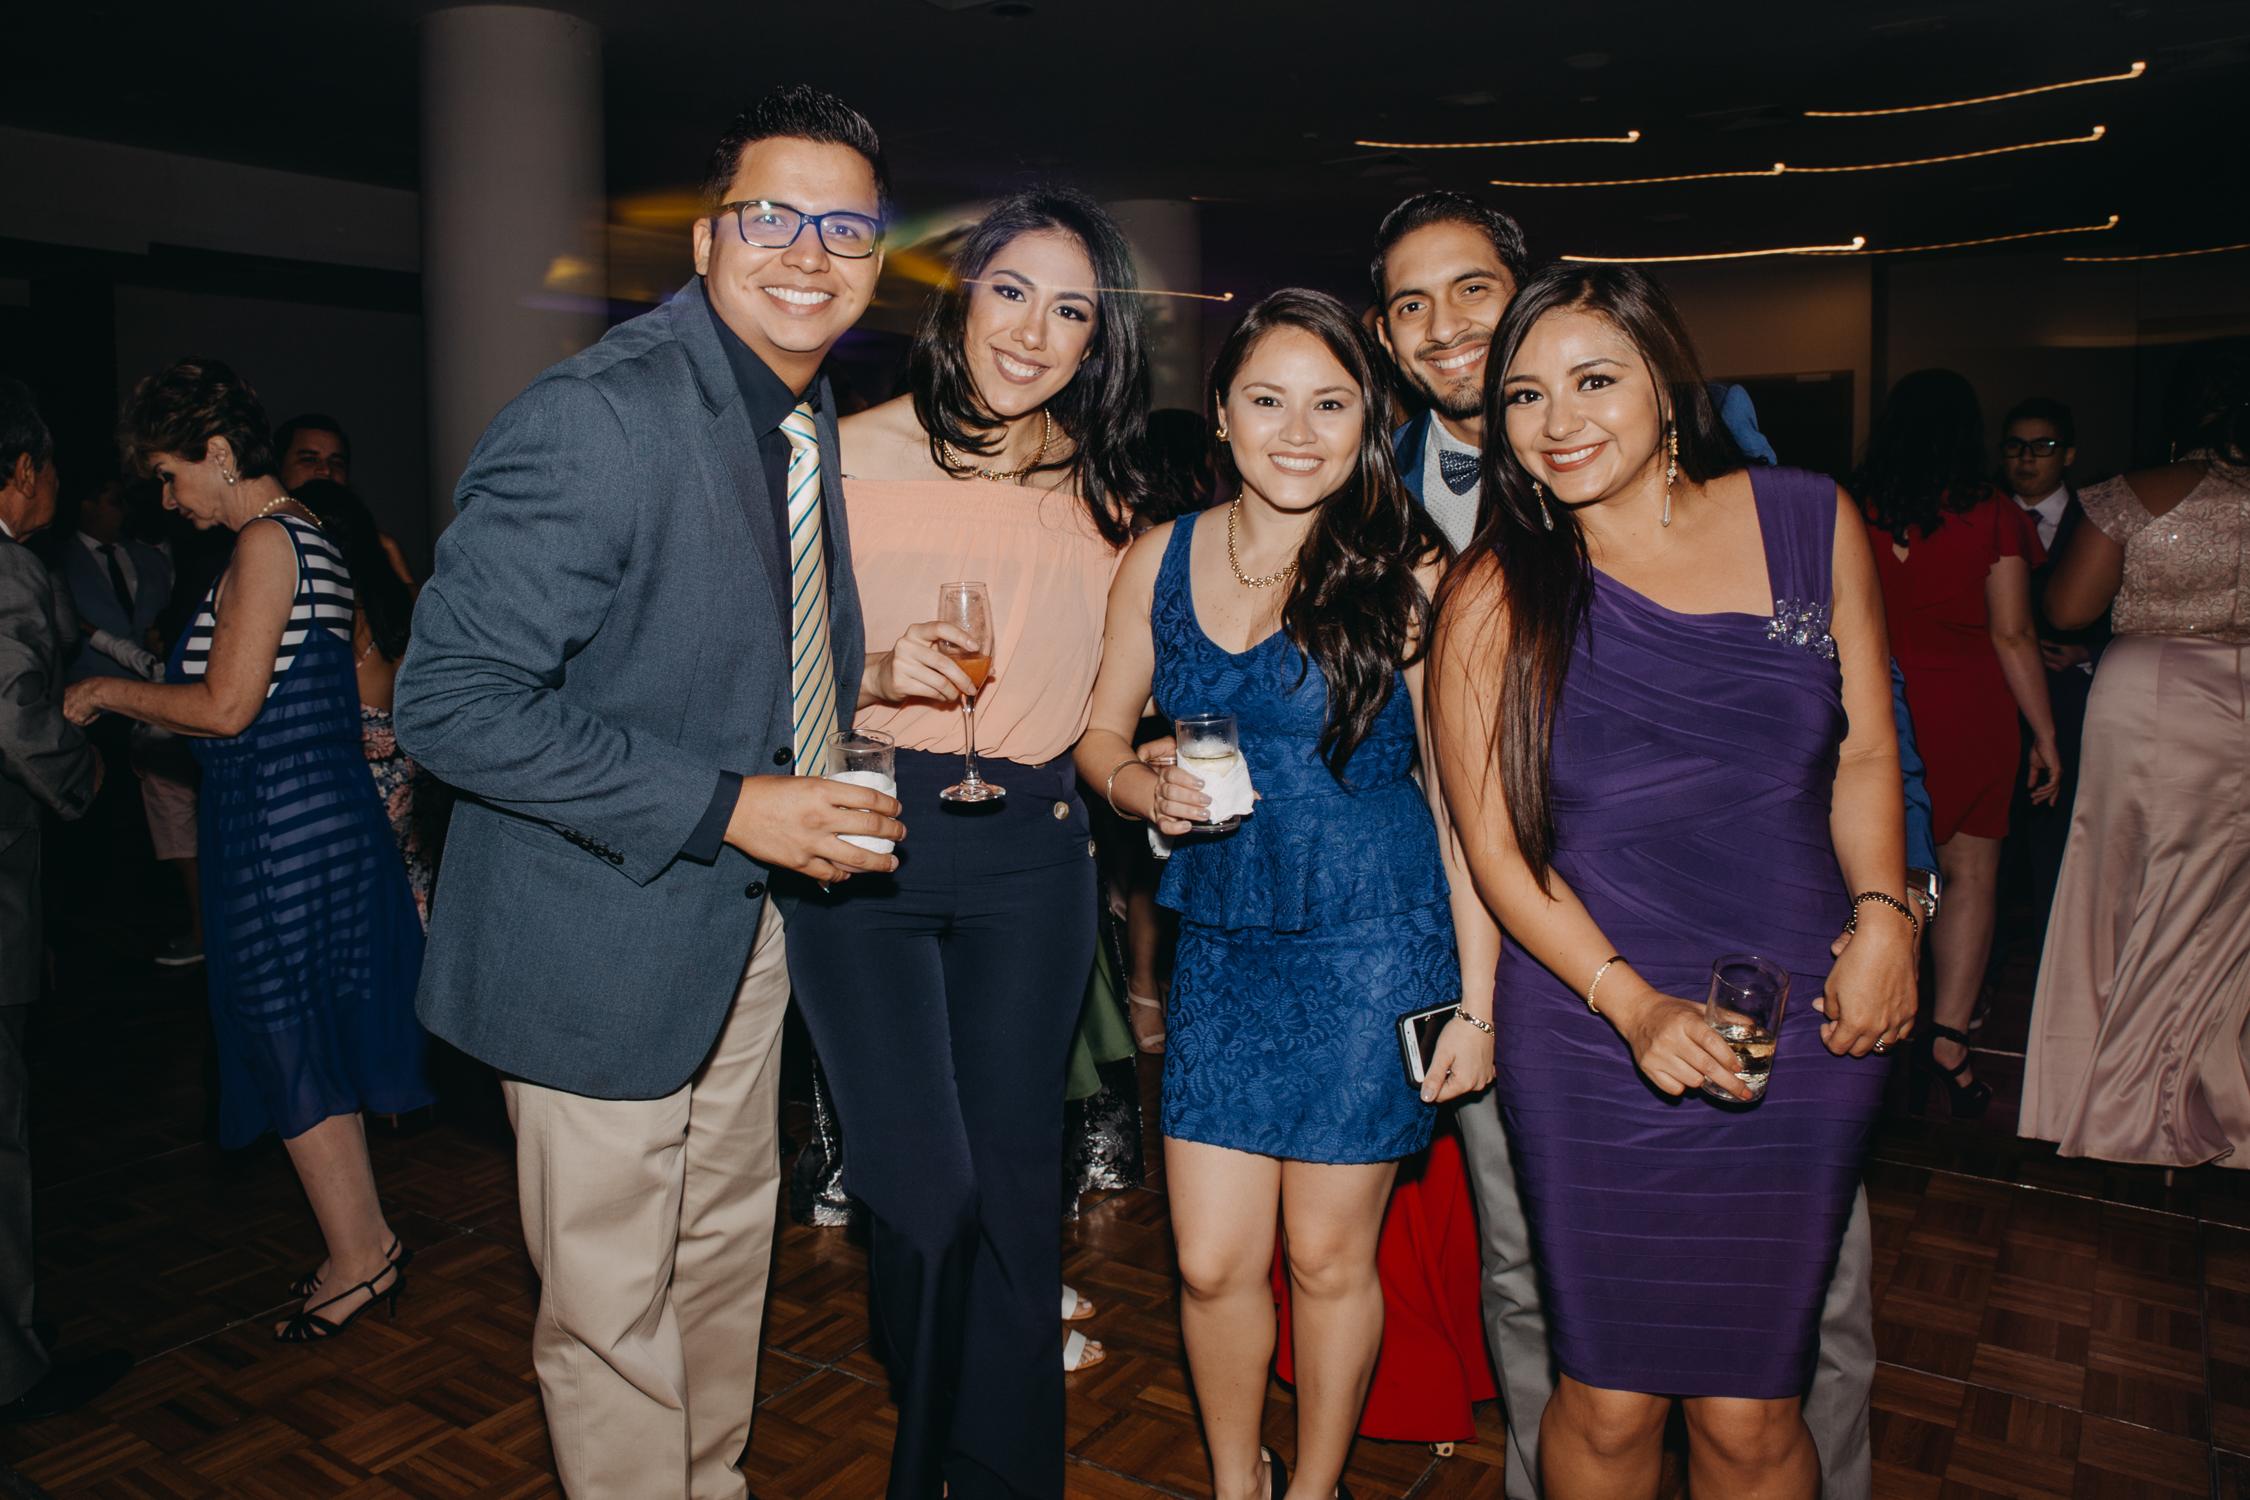 Michelle-Agurto-Fotografia-Bodas-Ecuador-Destination-Wedding-Photographer-Daniela-Dirk-70.JPG